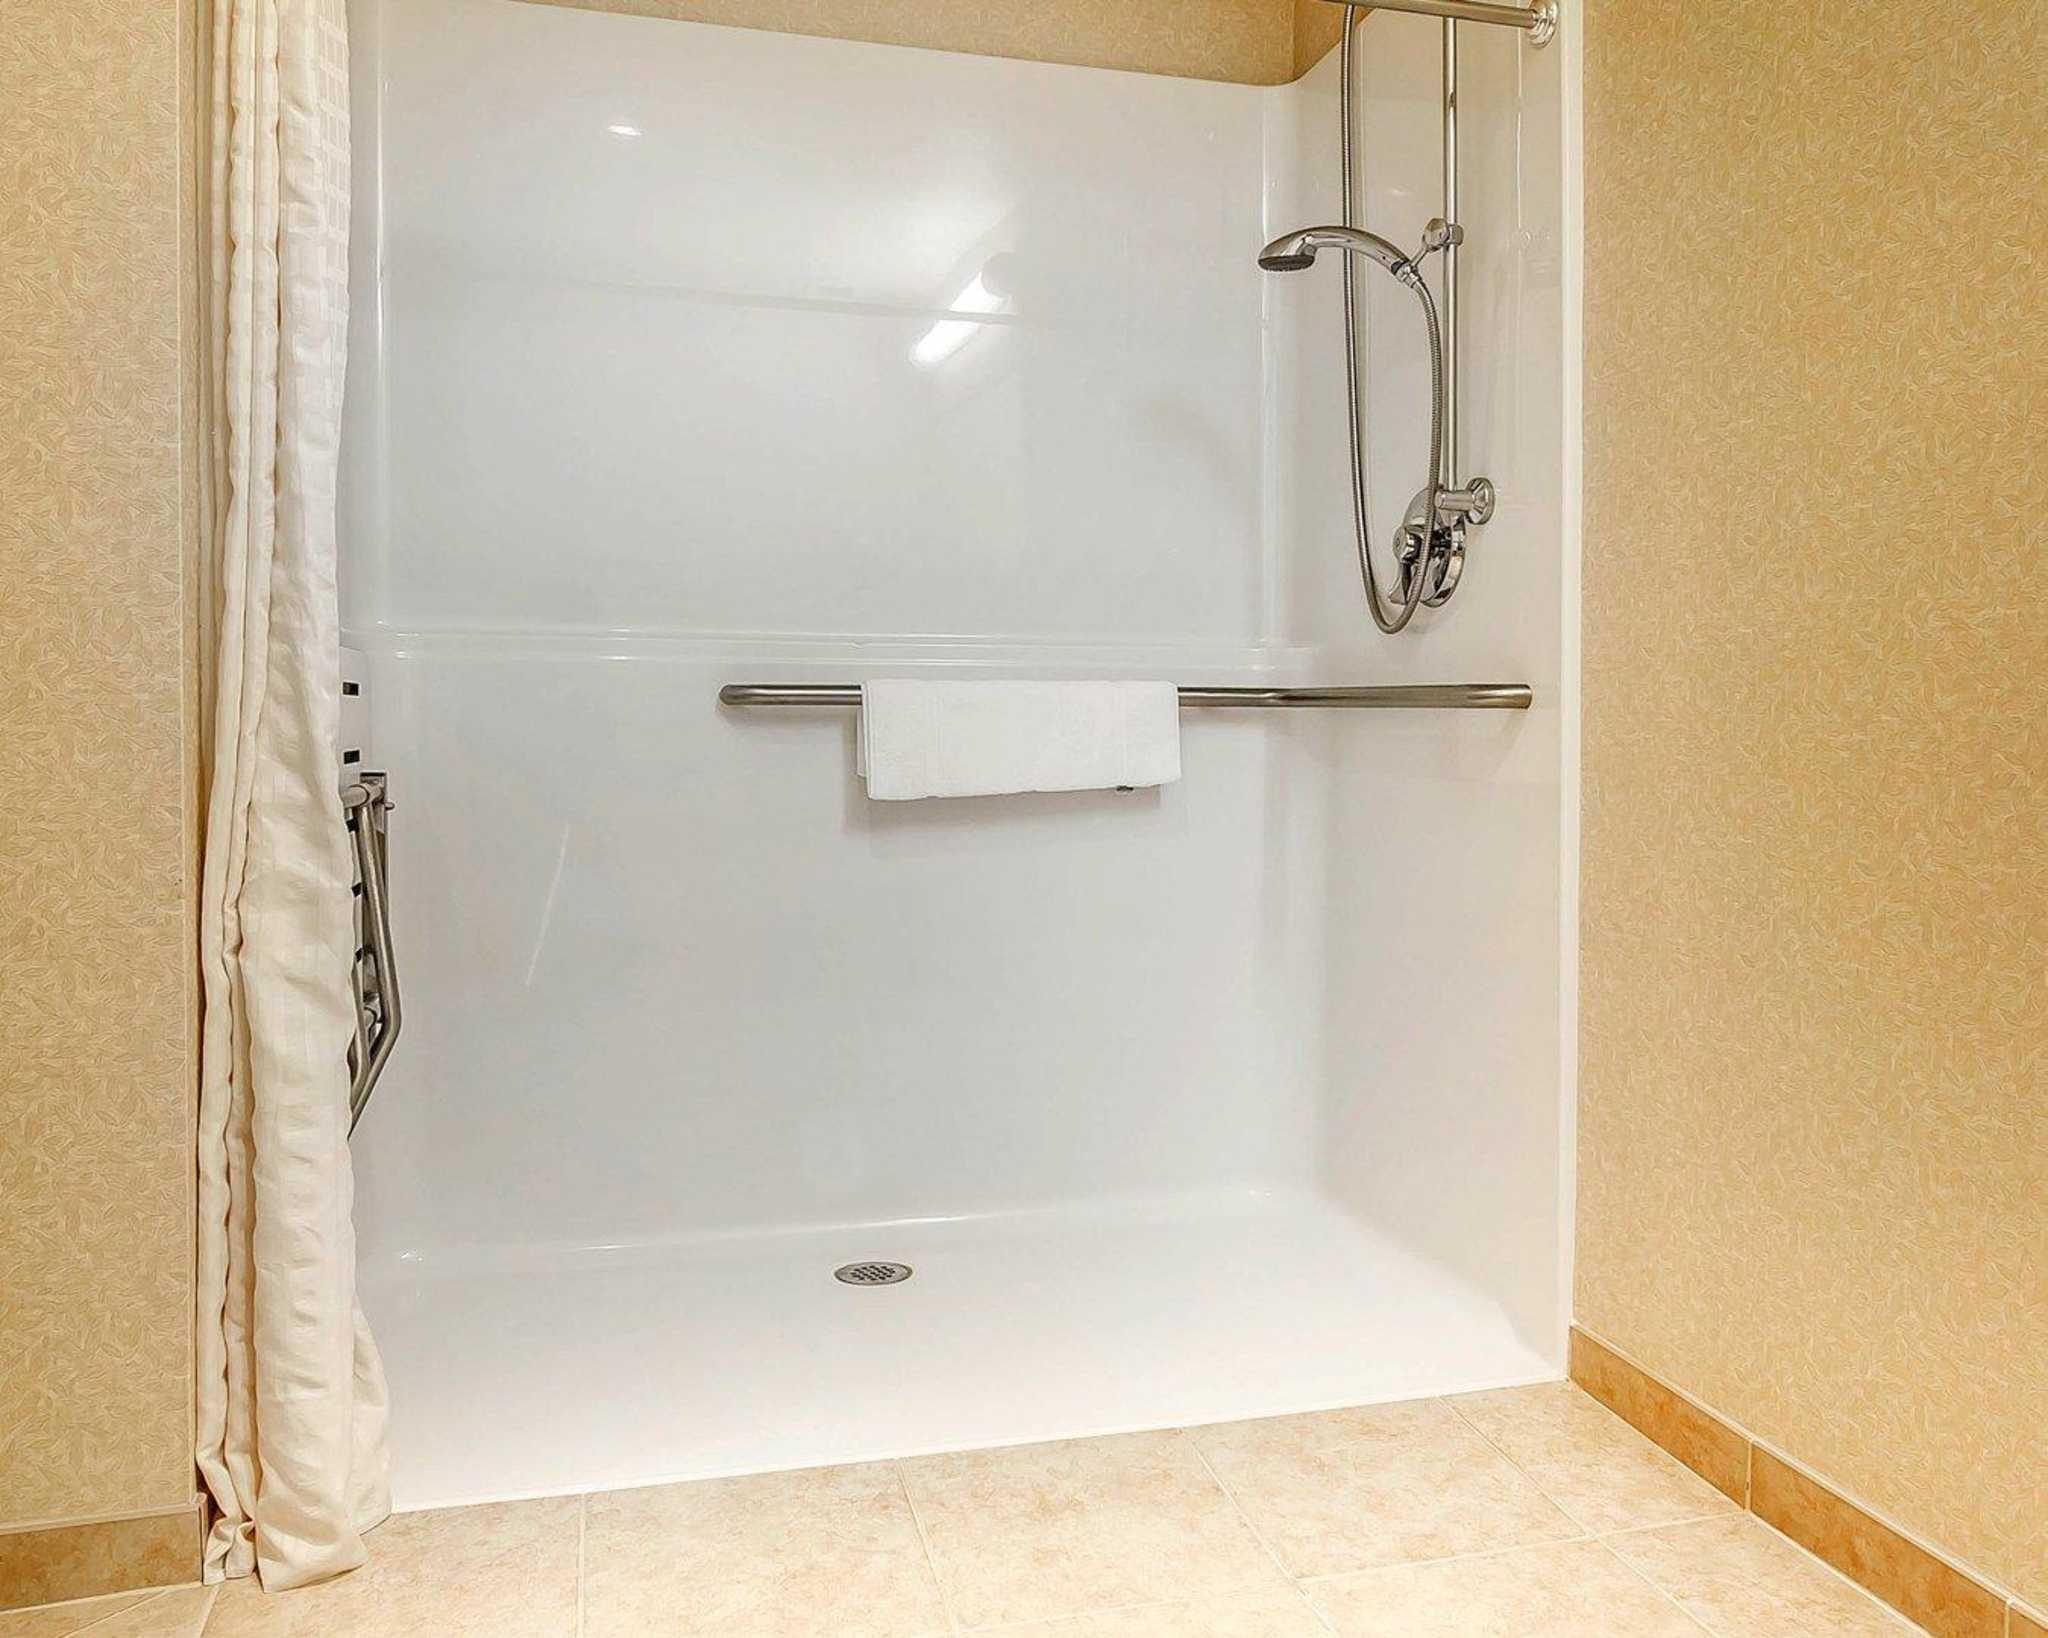 Comfort Inn & Suites image 11